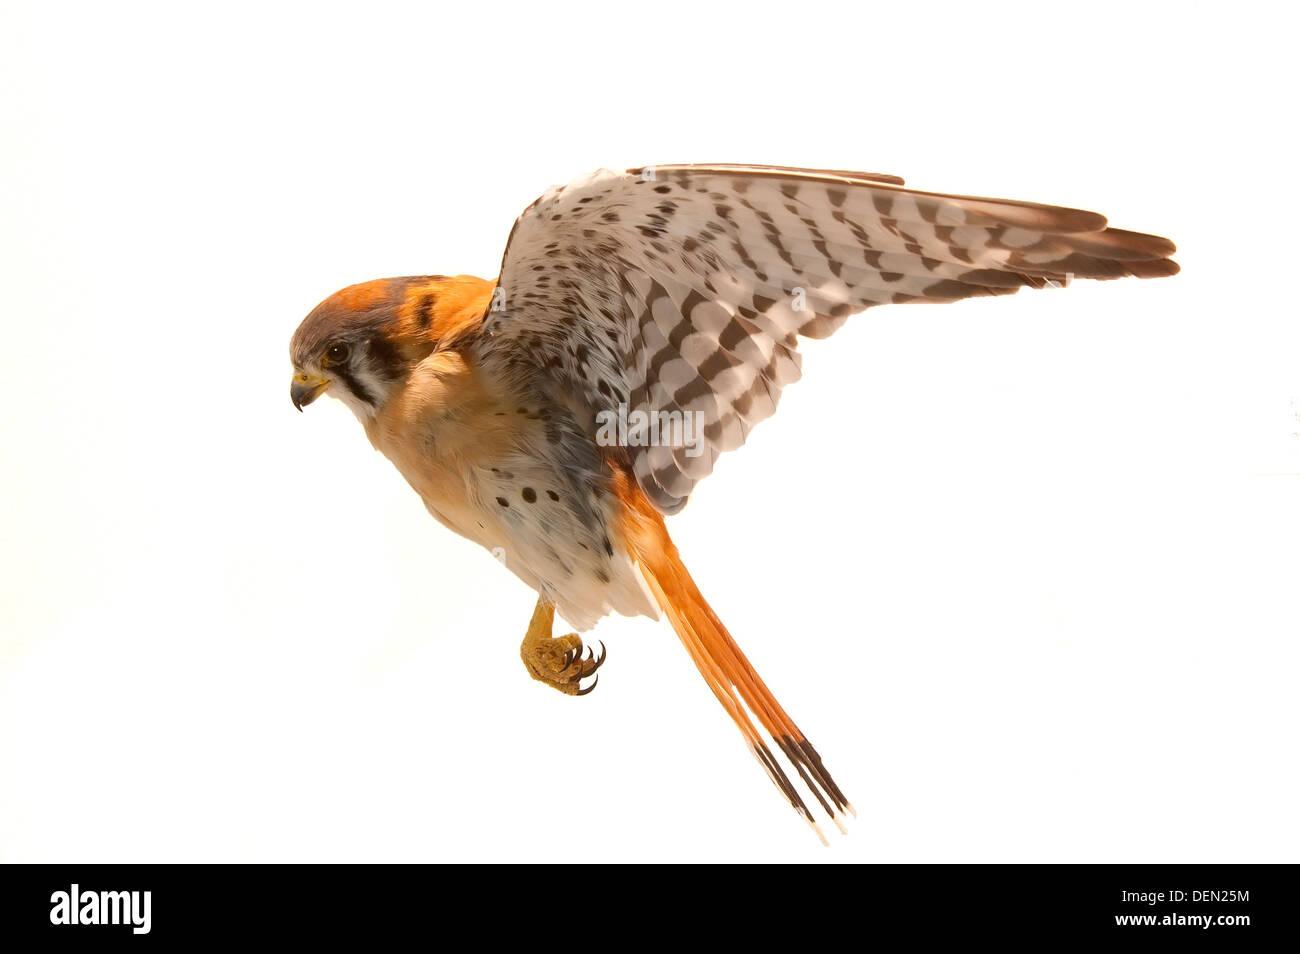 American Kestrel, Falco sparverius in mid air - Stock Image